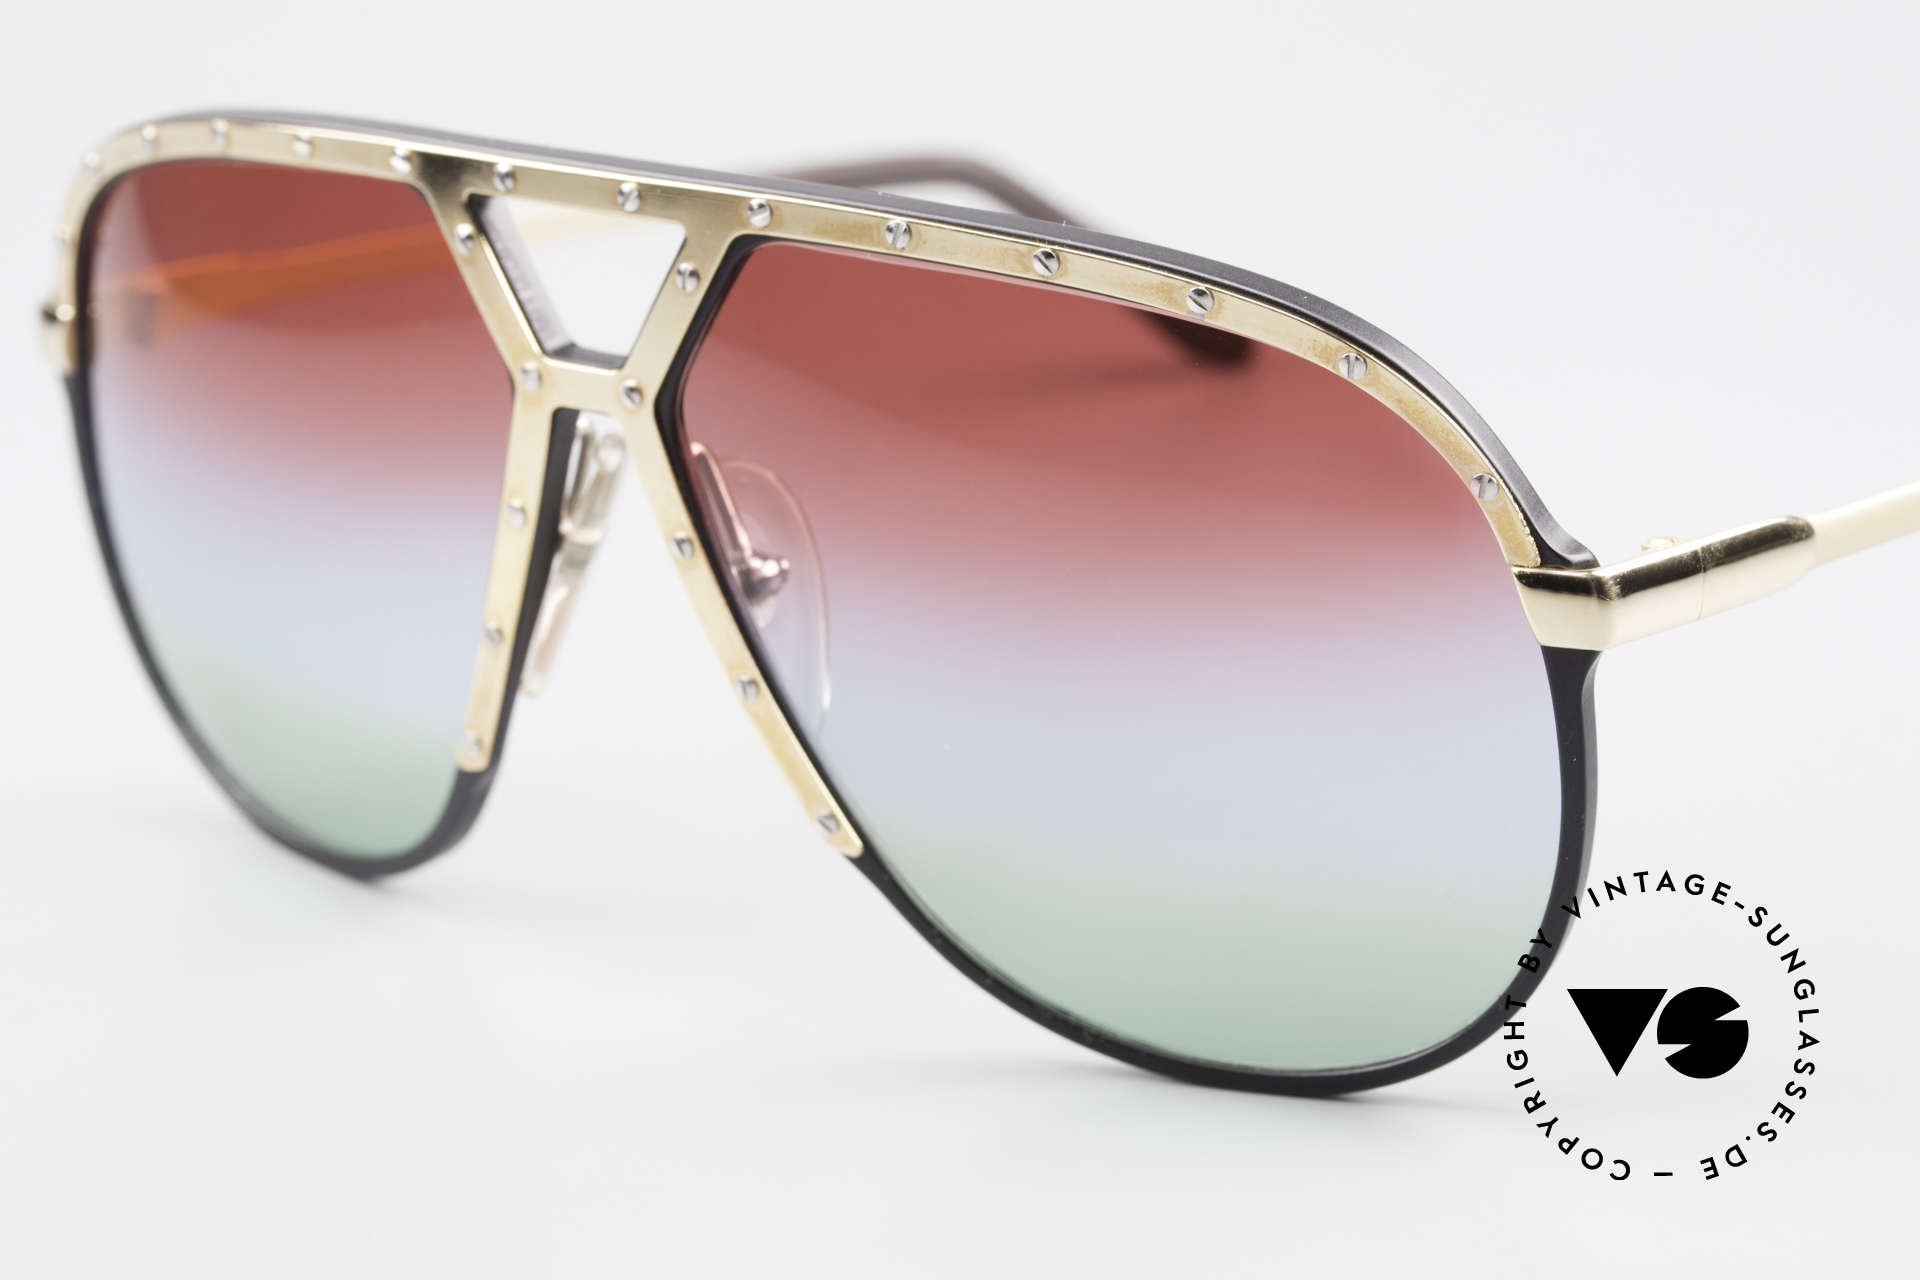 Alpina M1 Customized 80's Sunglasses, customized triple-gradient sun lenses 'Polar Lights', Made for Men